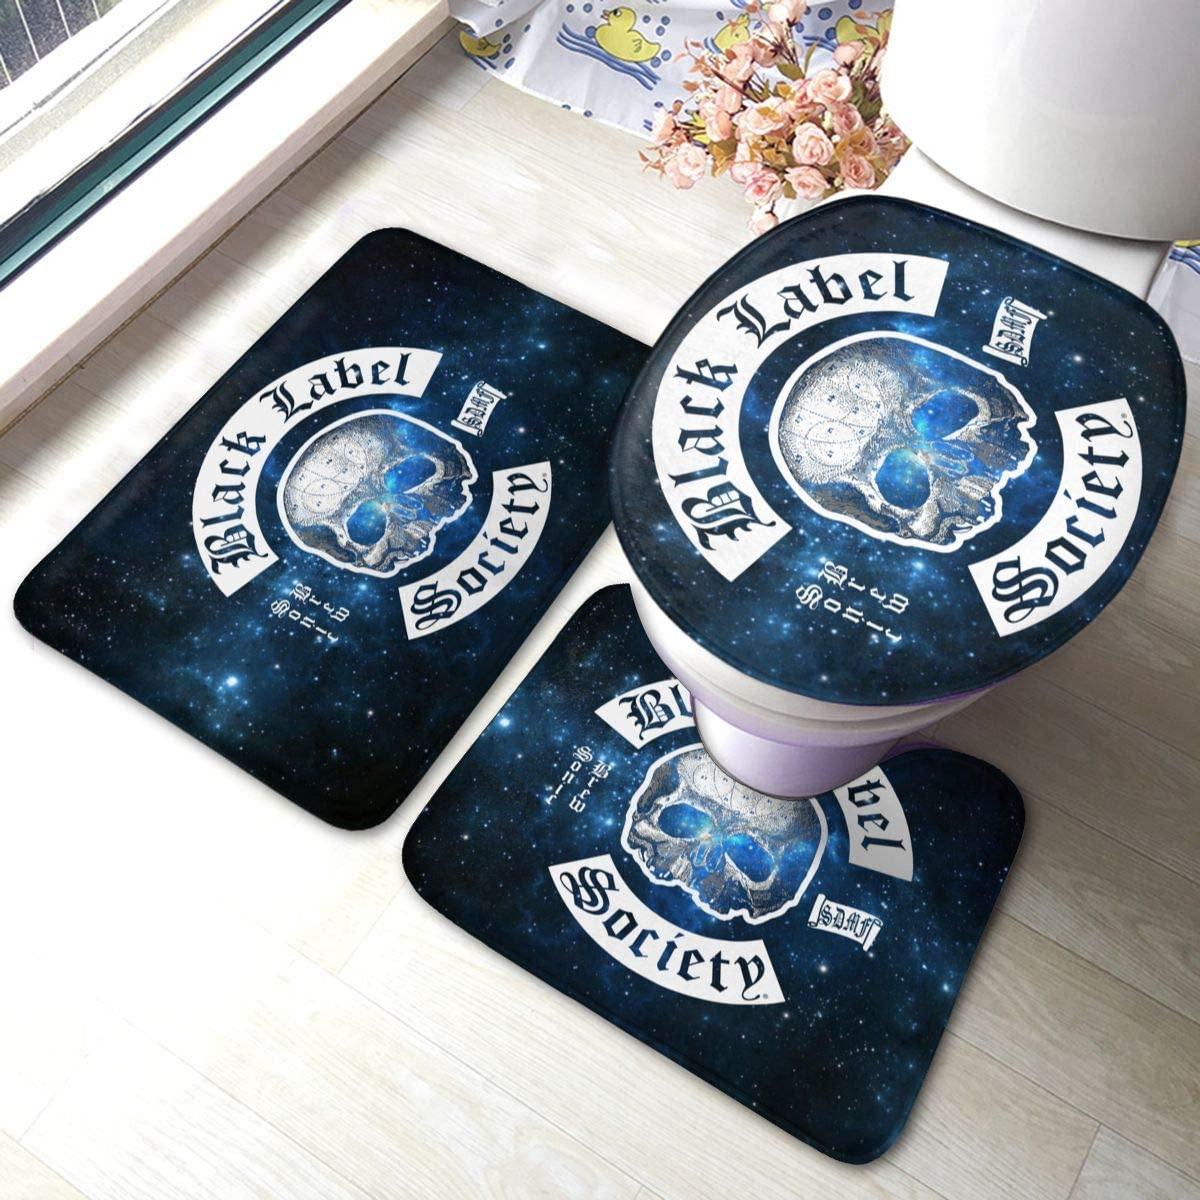 KatieTPappas Black Label Society Sonic Brew Durable Bathroom Rug Mats Set 3 Piece Anti-Skid Pads Bath Mat + Contour + Toilet Lid Cover